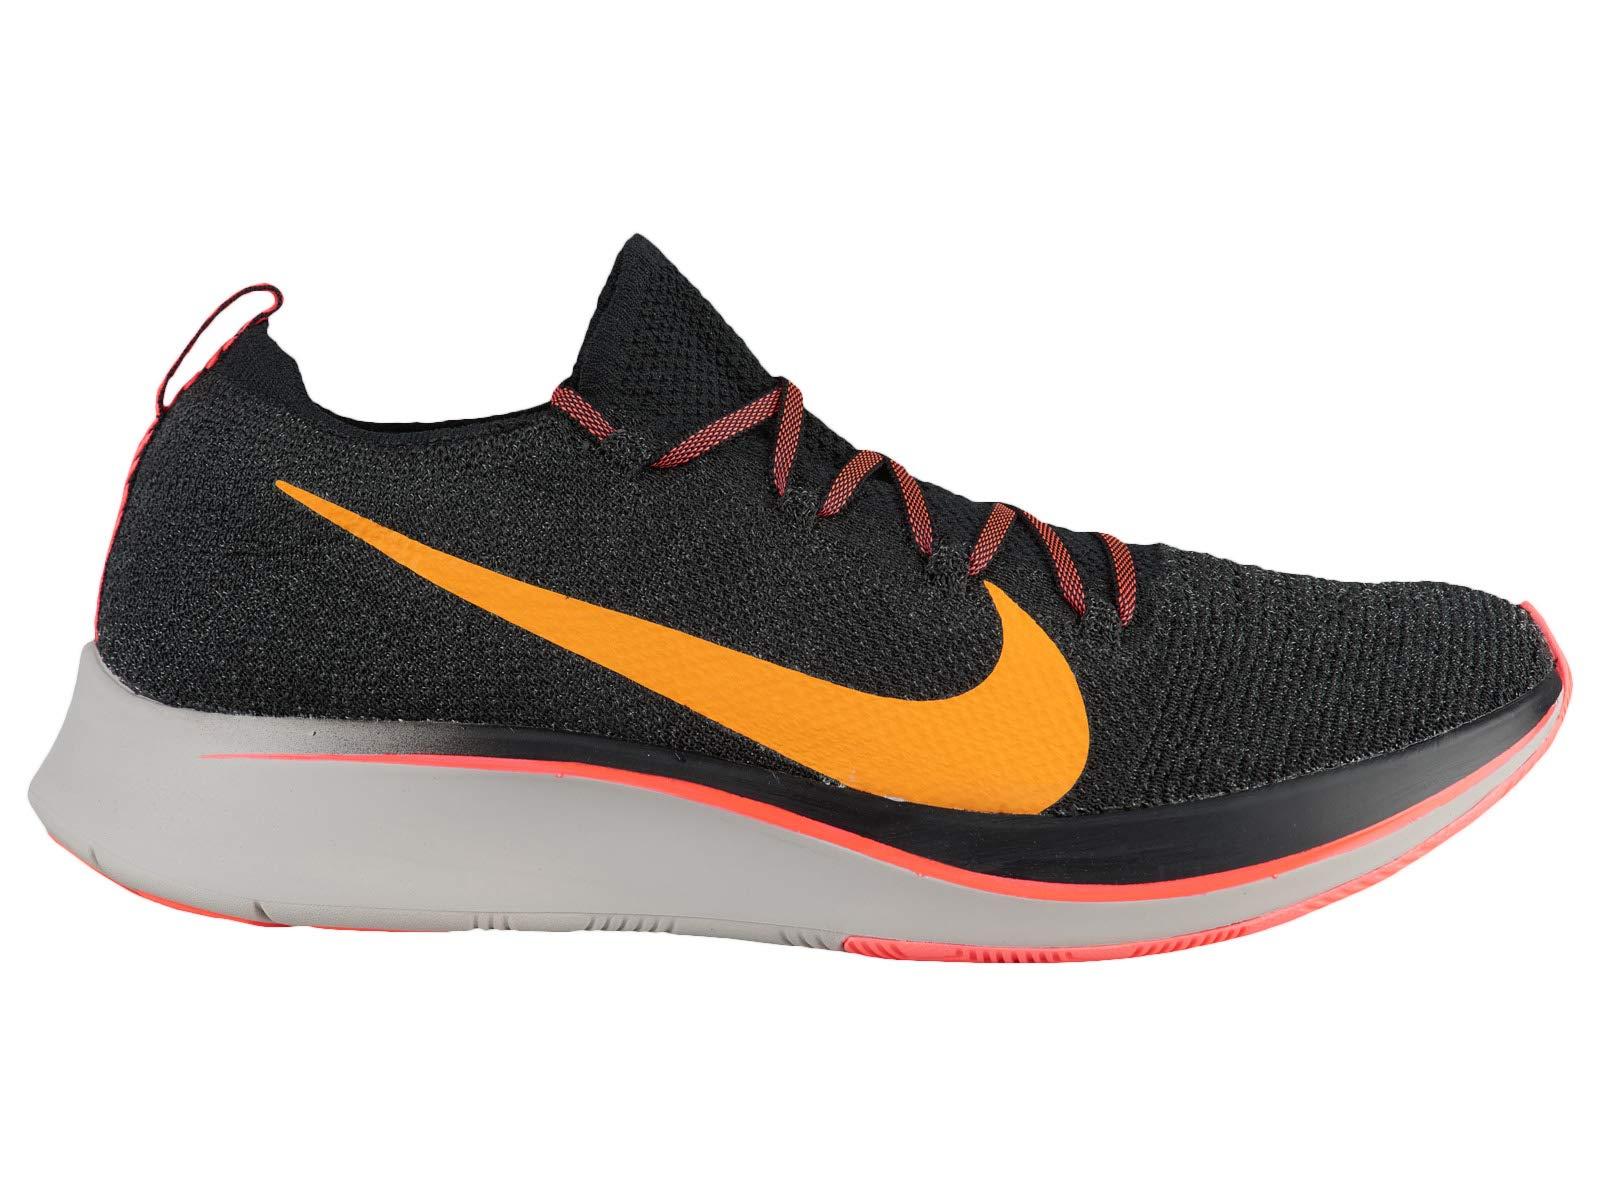 Nike Men's Zoom Fly Flyknit Black/Flash Crimson/Orange Peel Nylon Running Shoes 6.5 M US